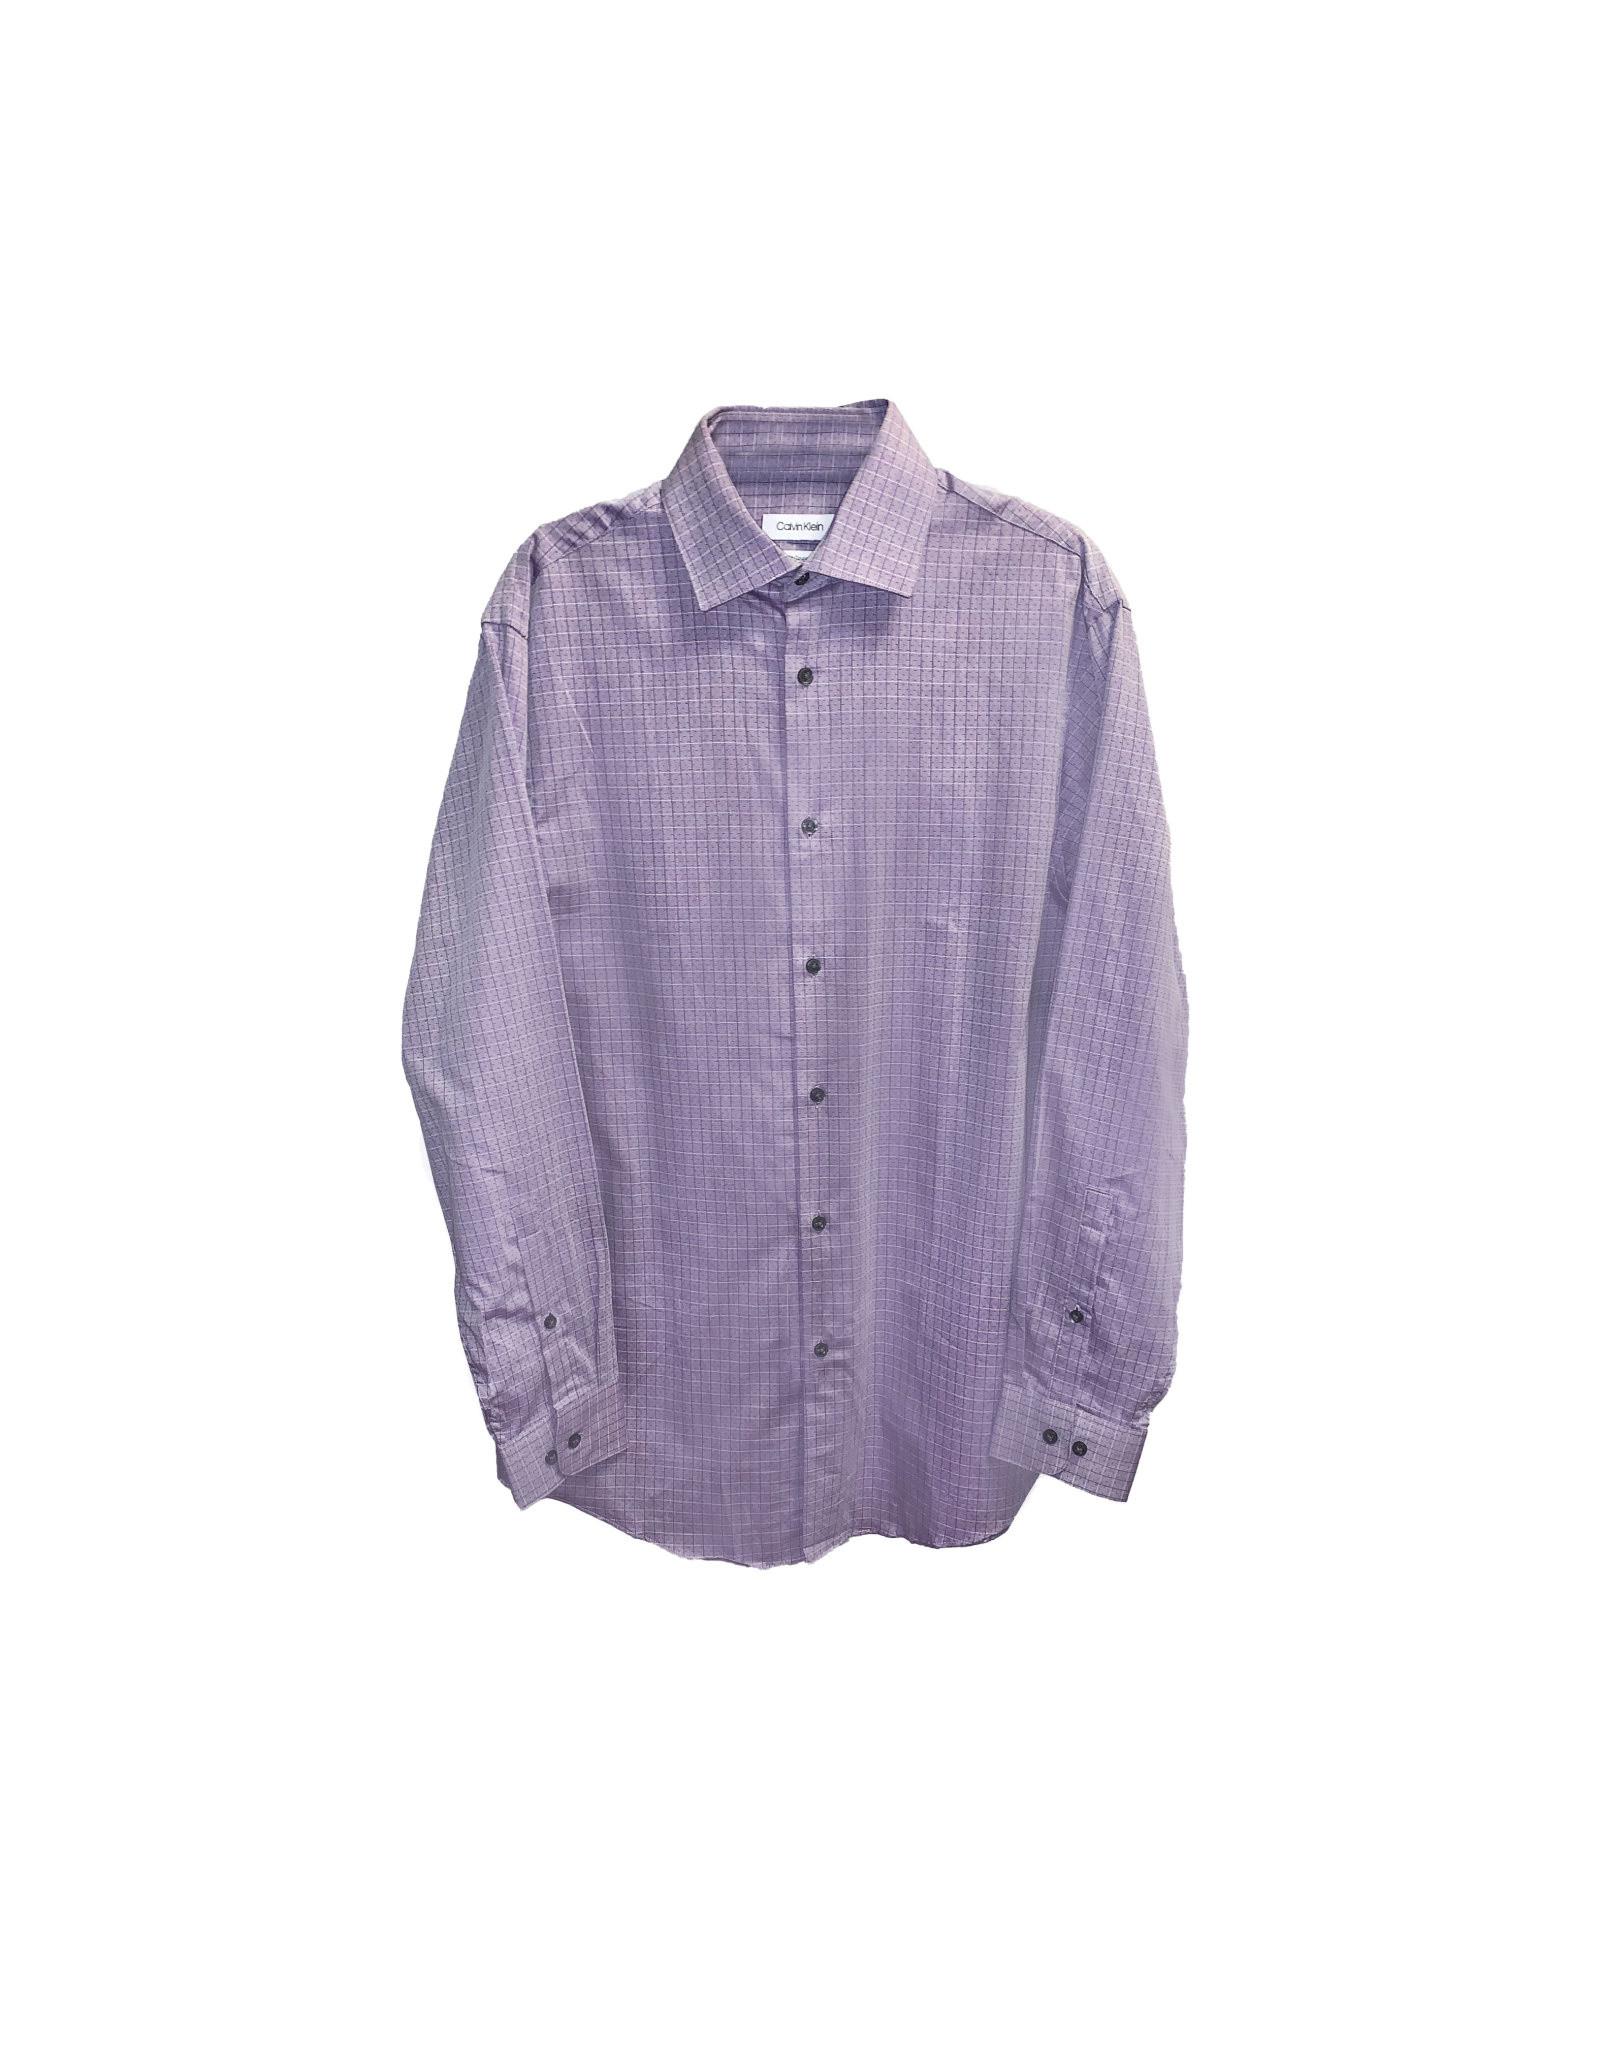 Calvin Klein Calvin Klein Regular Fit Shirt Size: 15 32-33 (M)